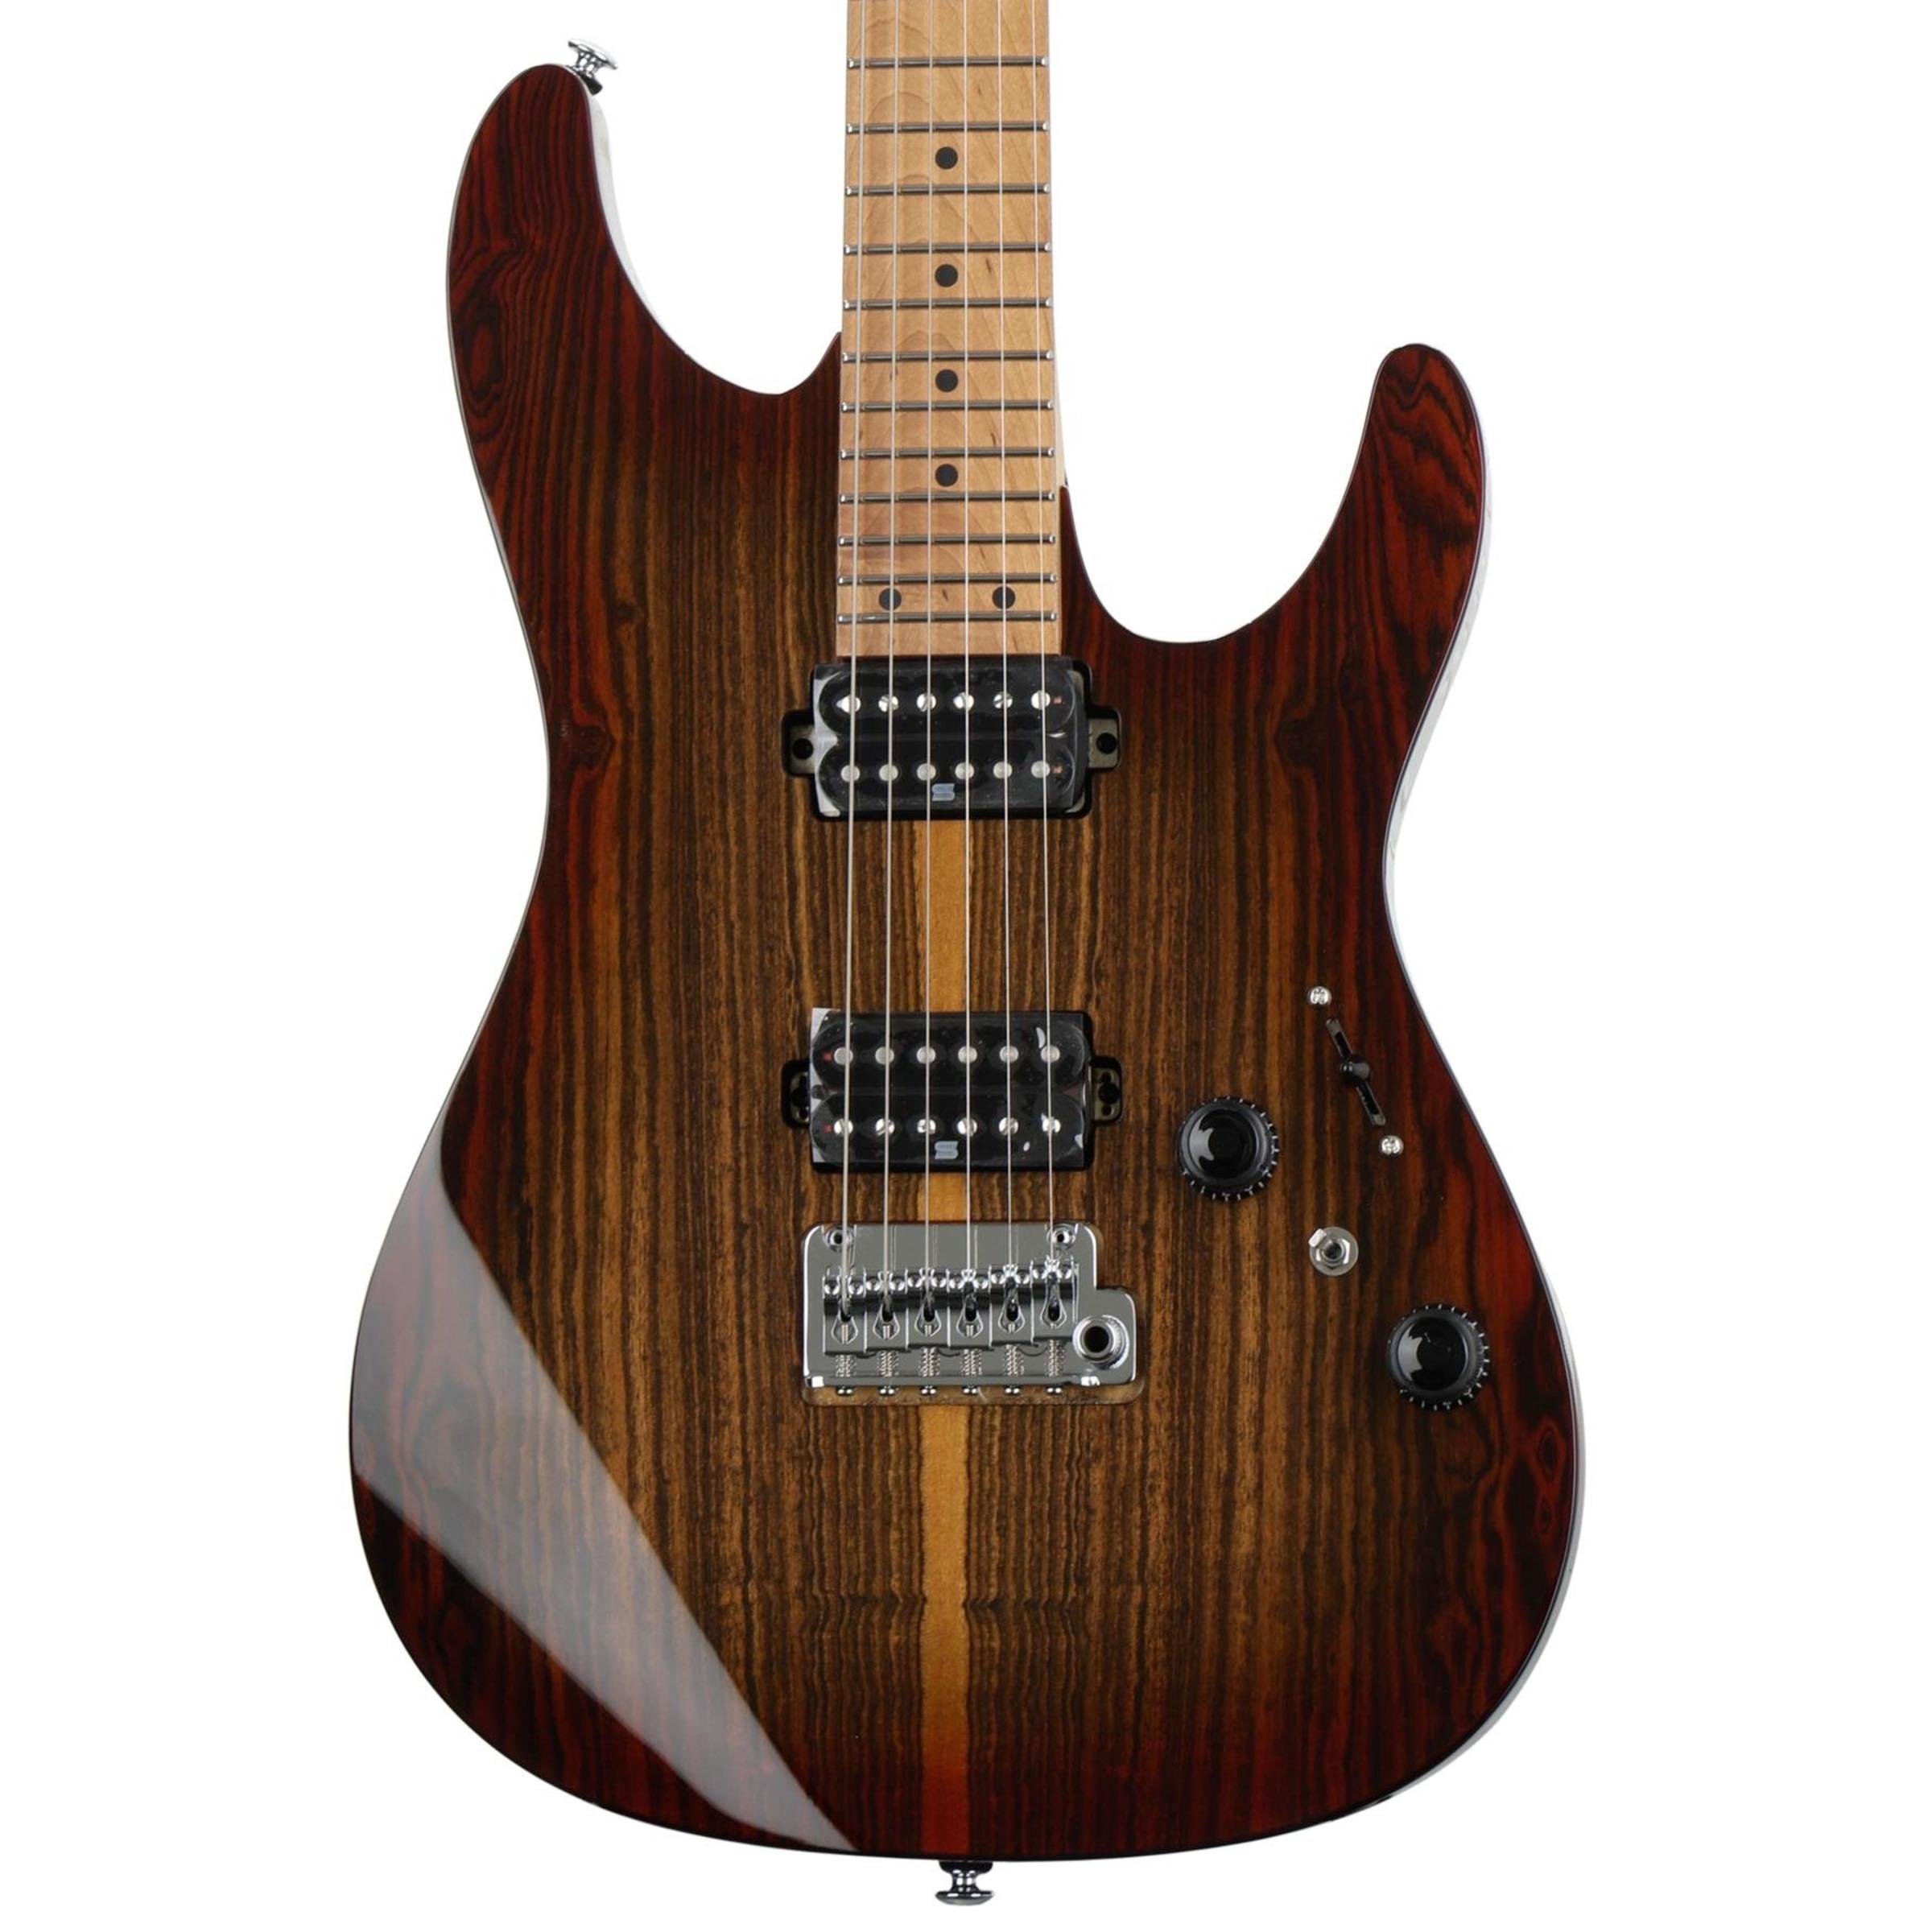 Buy Electric Guitar Online Uk : ibanez az242 electric guitar giggear ~ Vivirlamusica.com Haus und Dekorationen